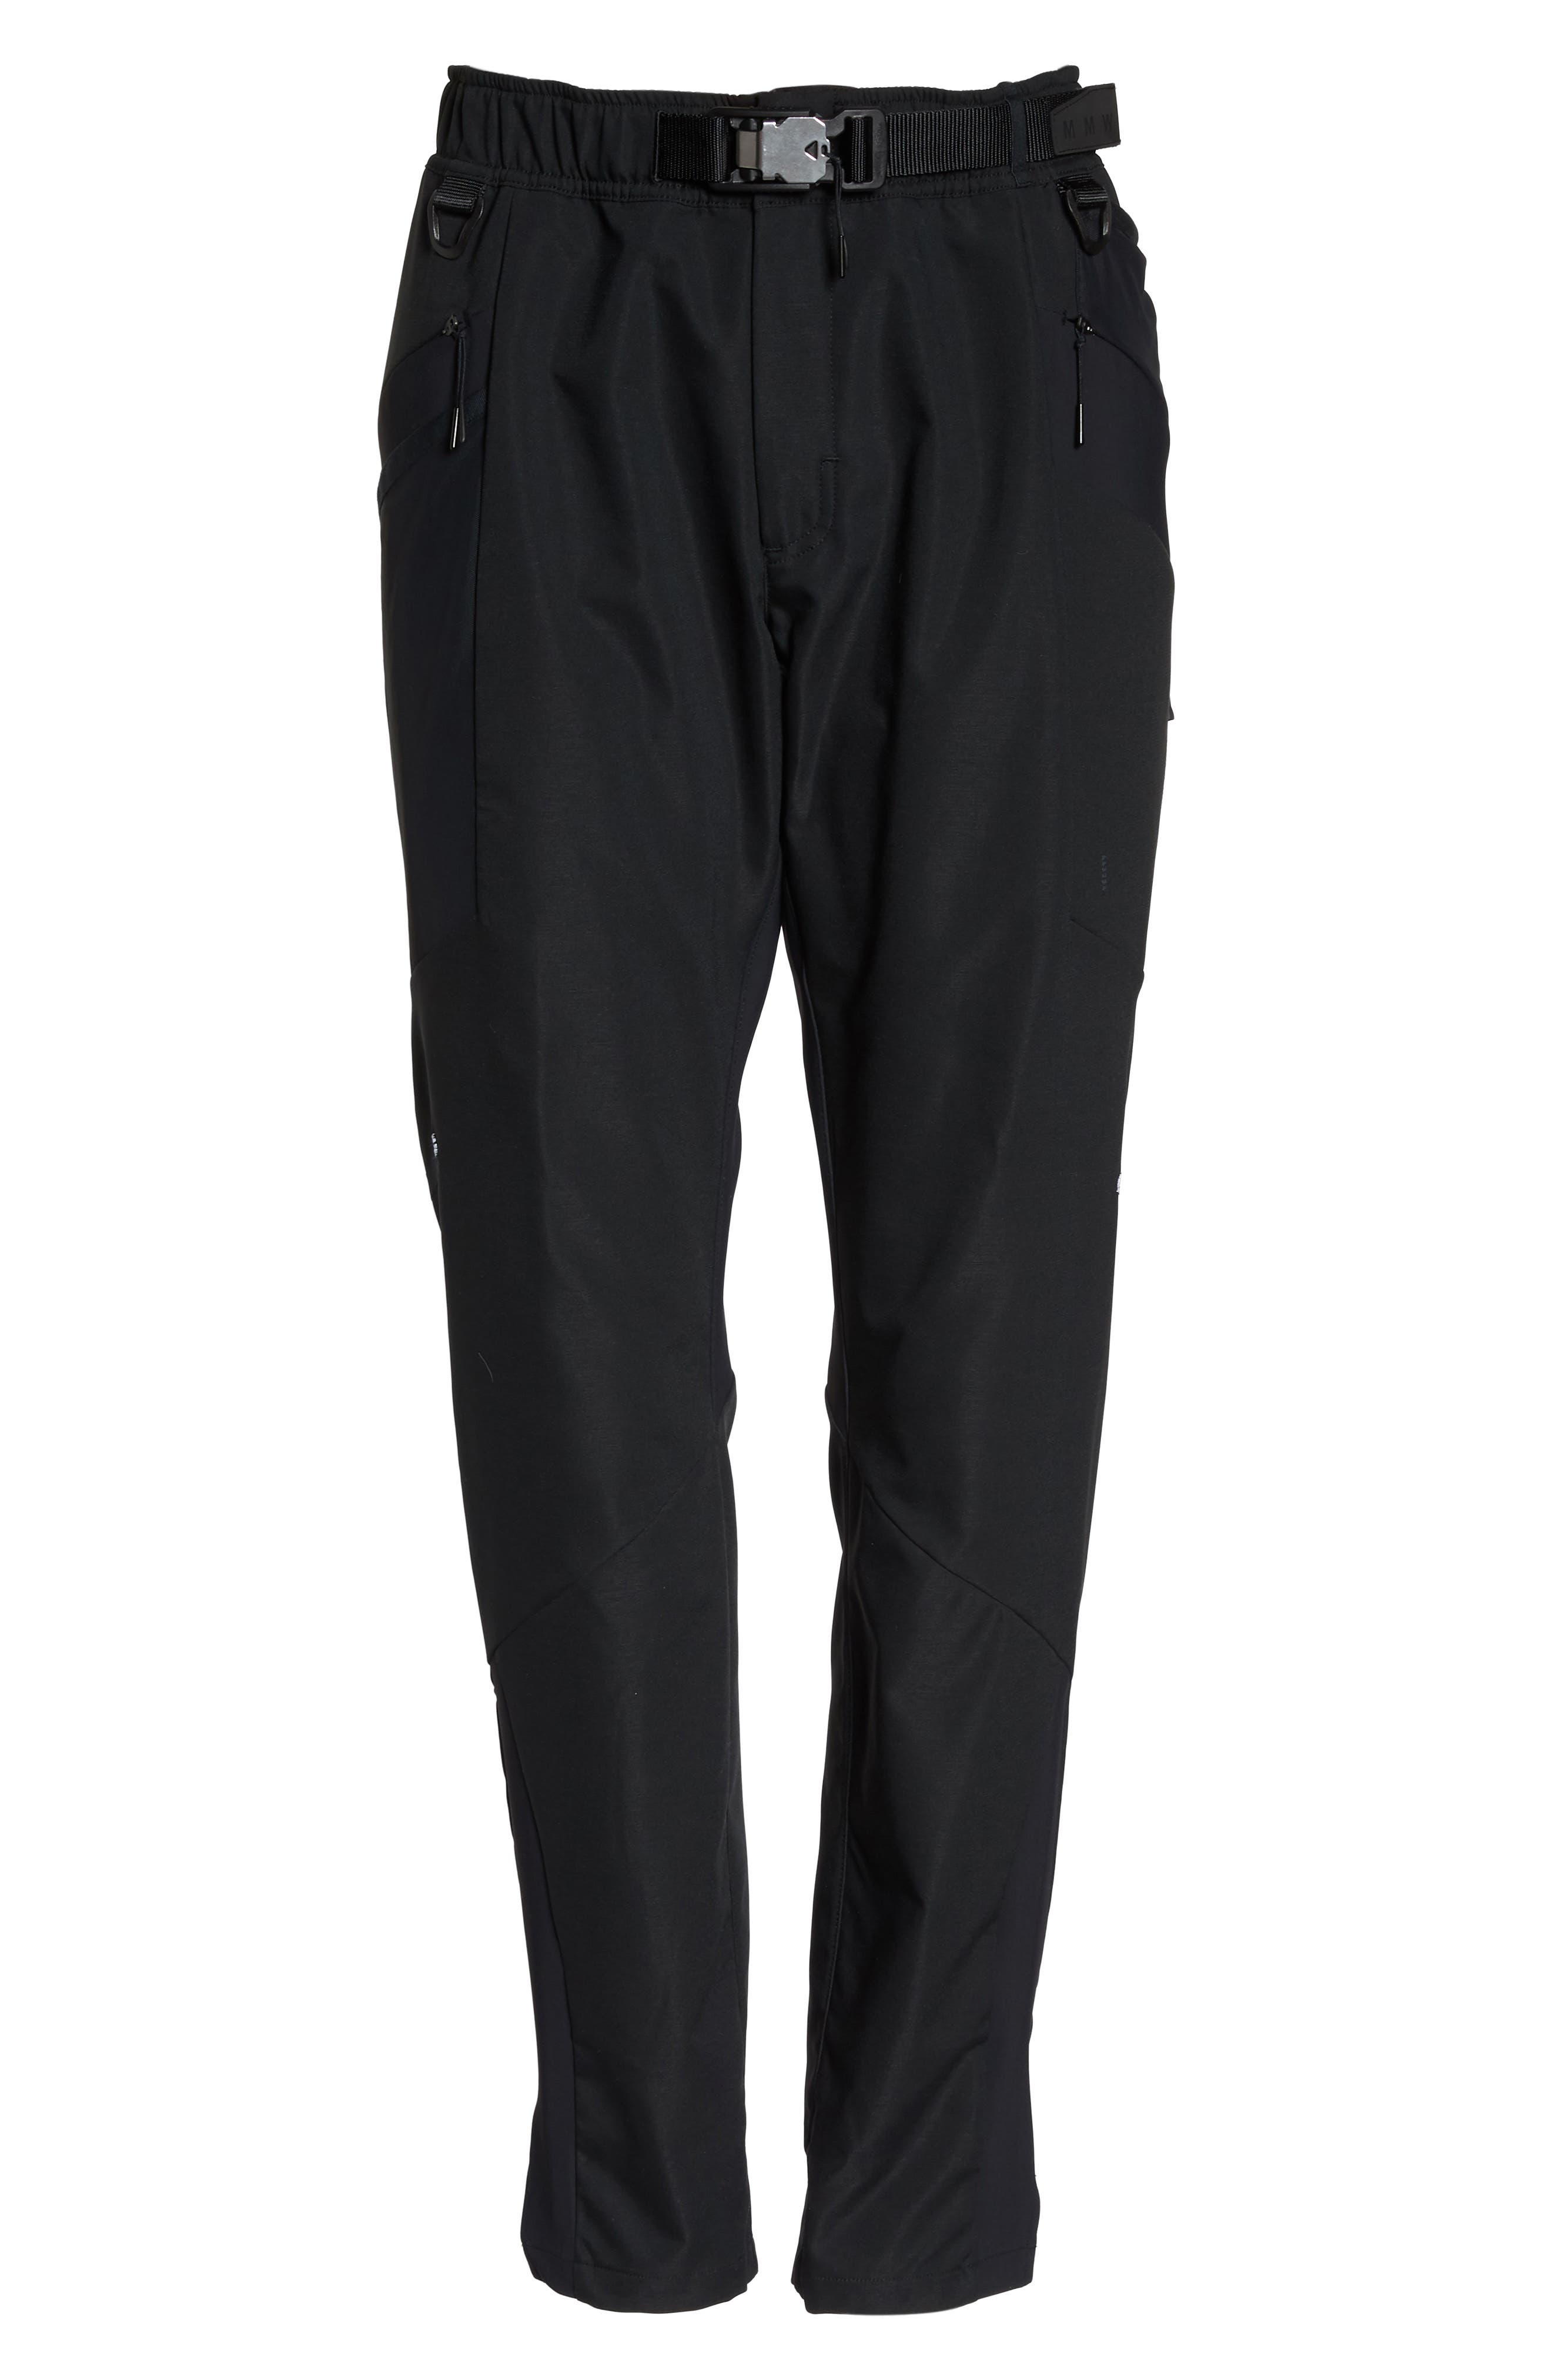 NIKE,                             NikeLab x MMW Women's Pants,                             Alternate thumbnail 7, color,                             010